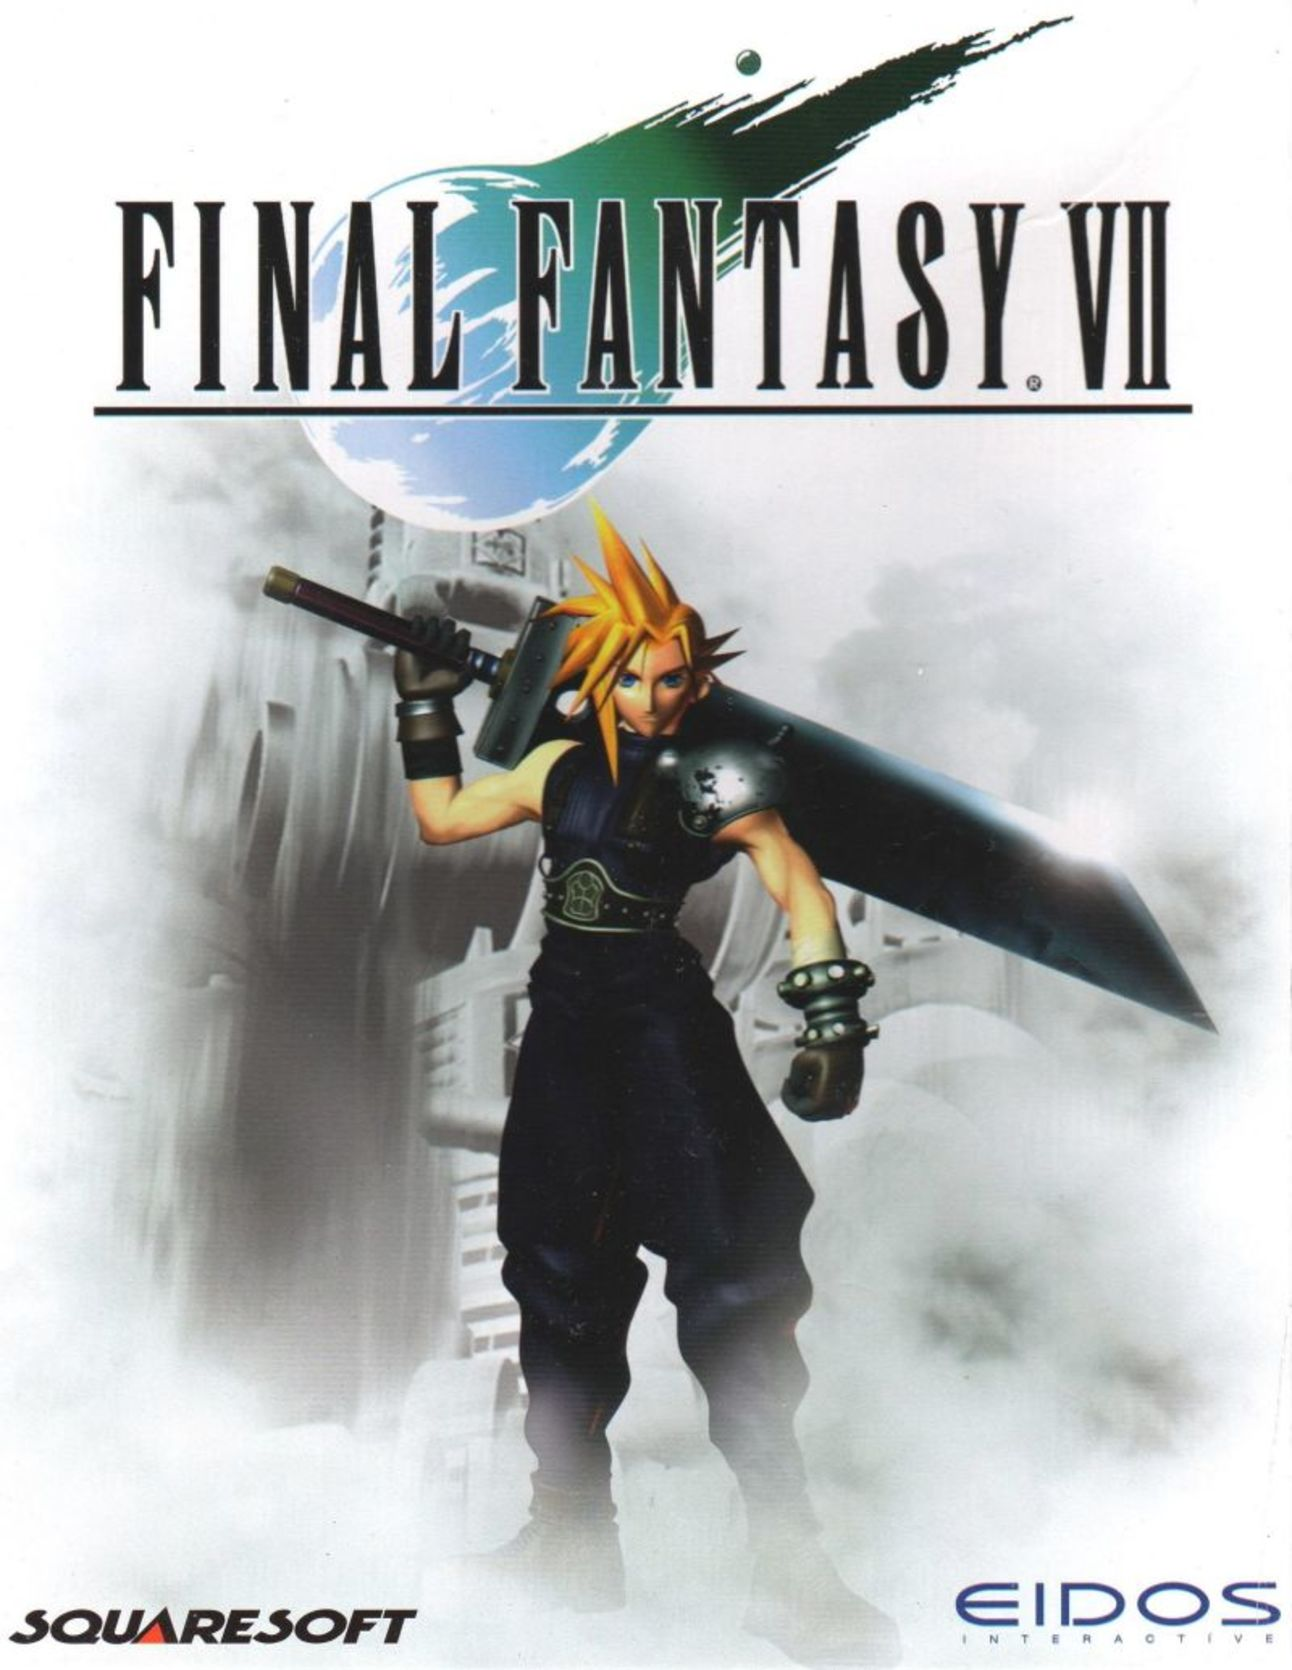 111355-final-fantasy-vii-windows-front-cover.jpg